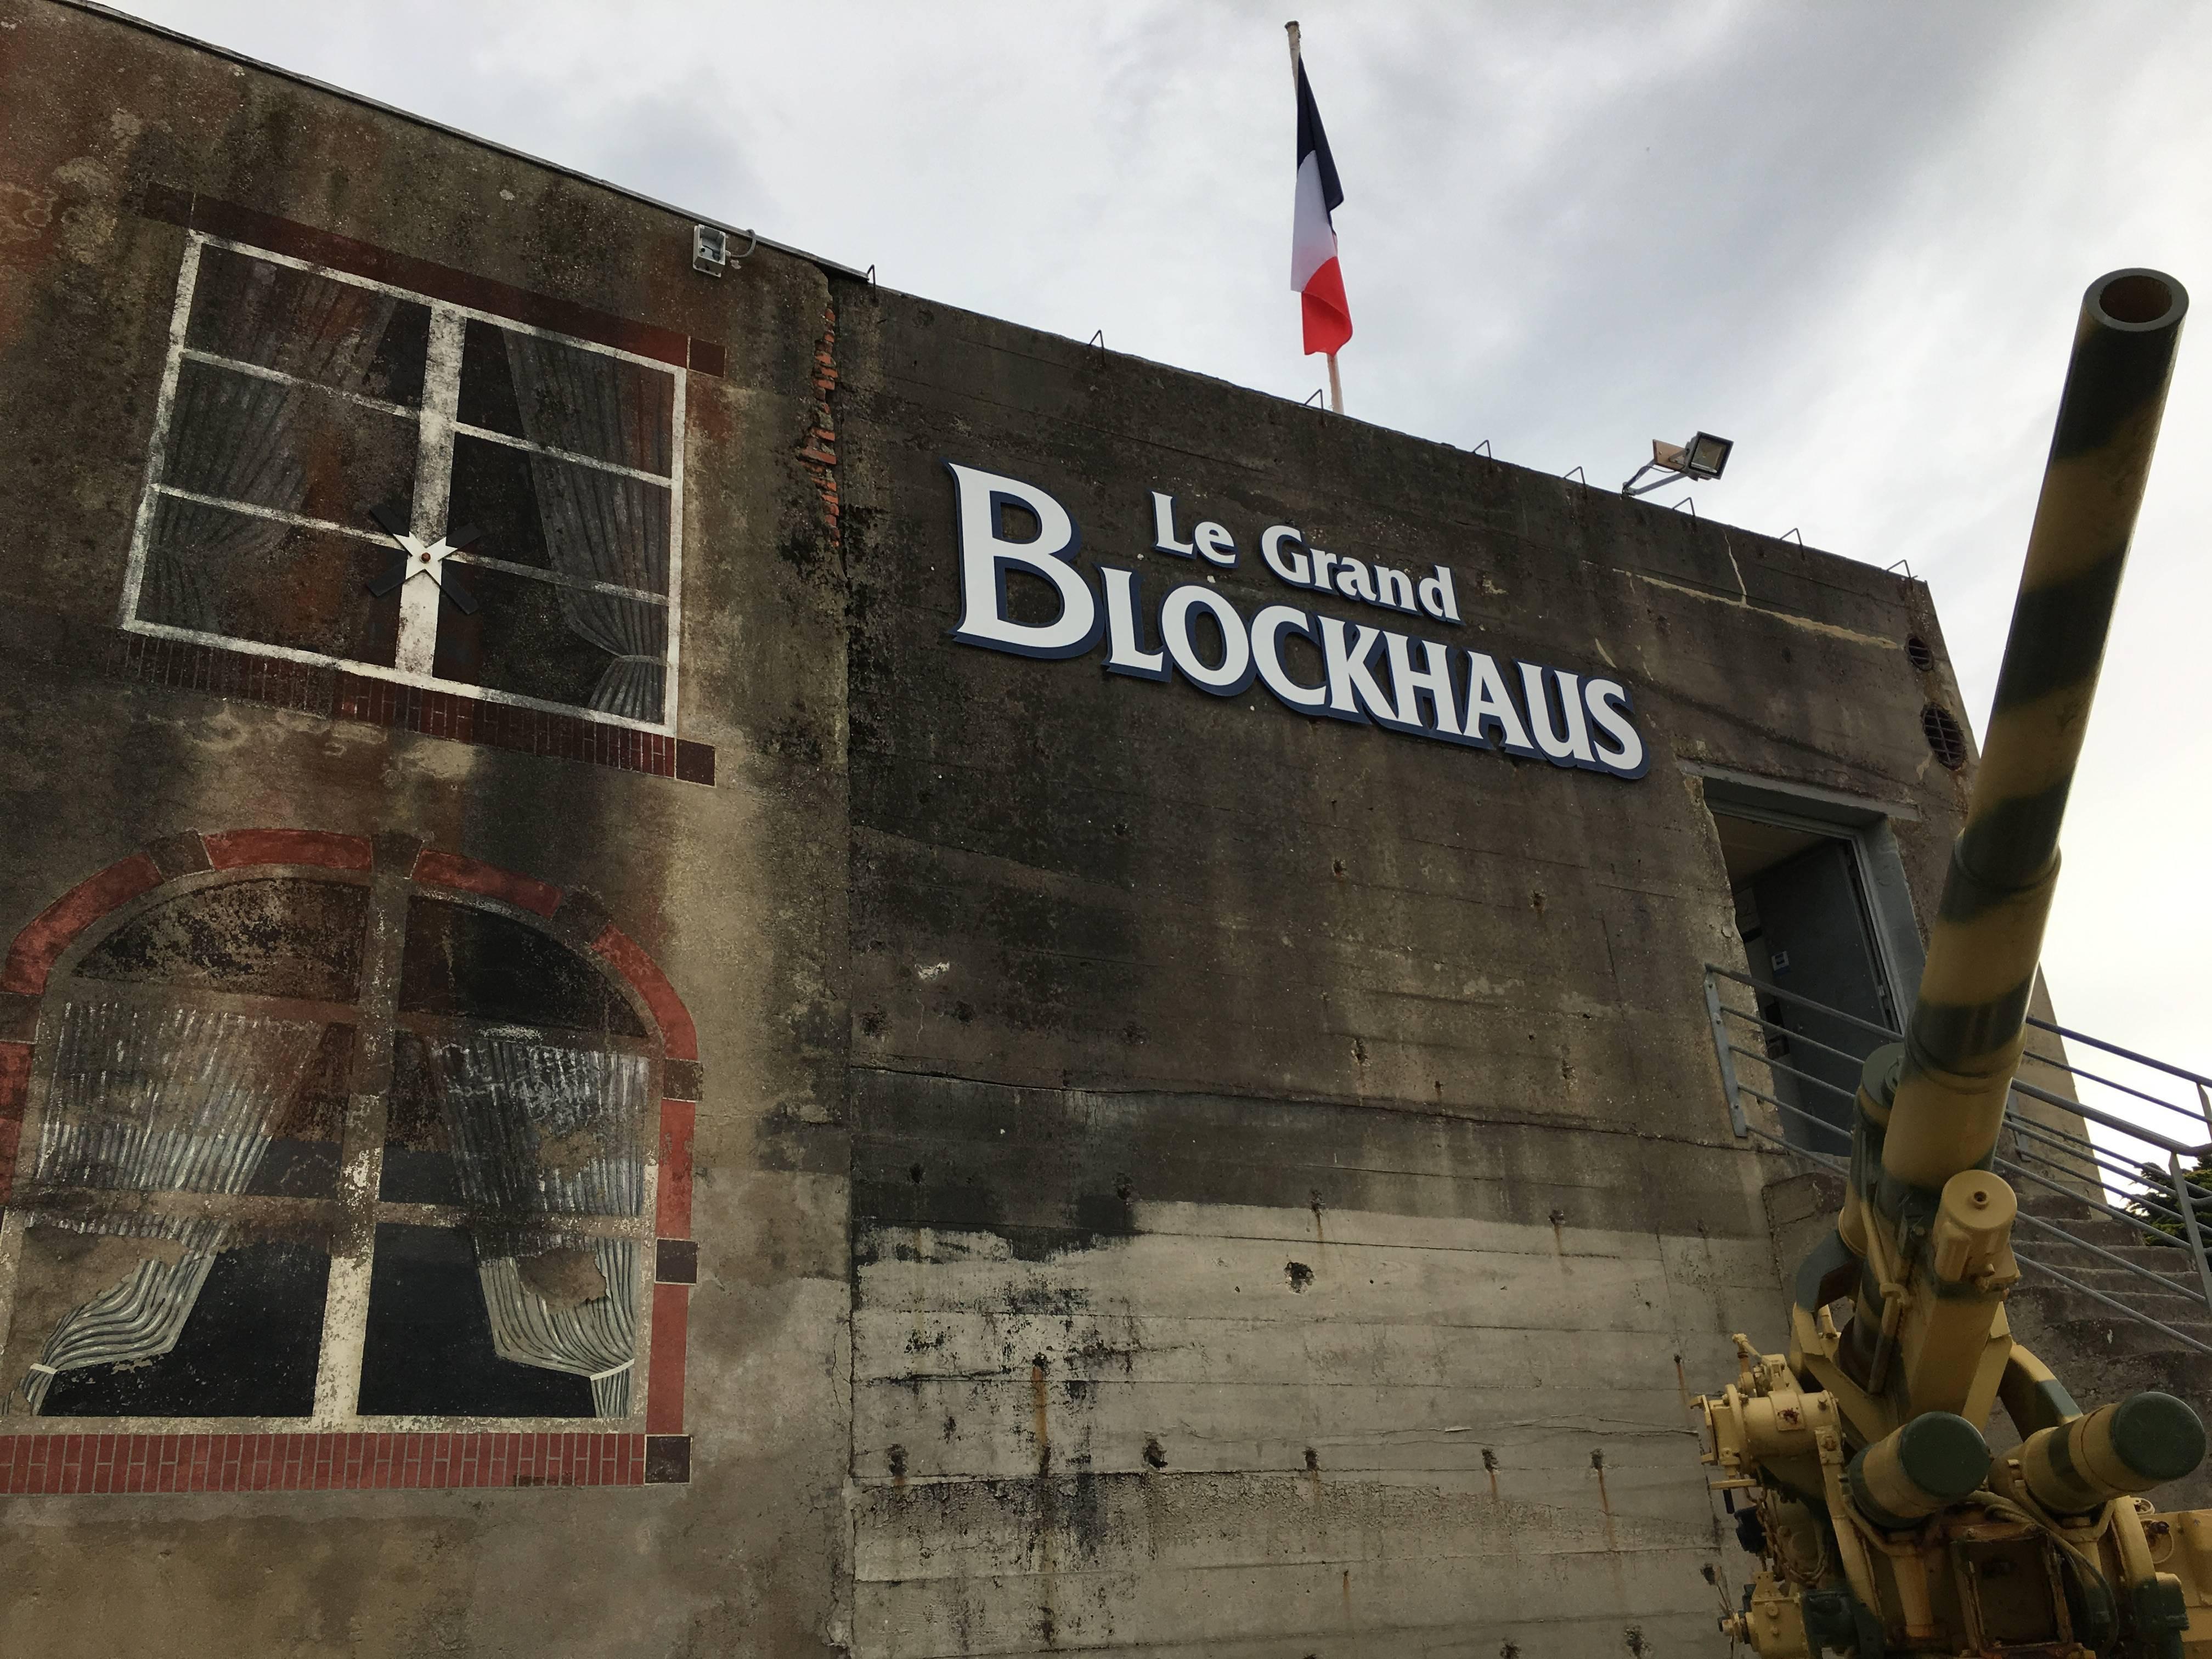 Photo 1: MUSEE DU GRAND BLOCKHAUS